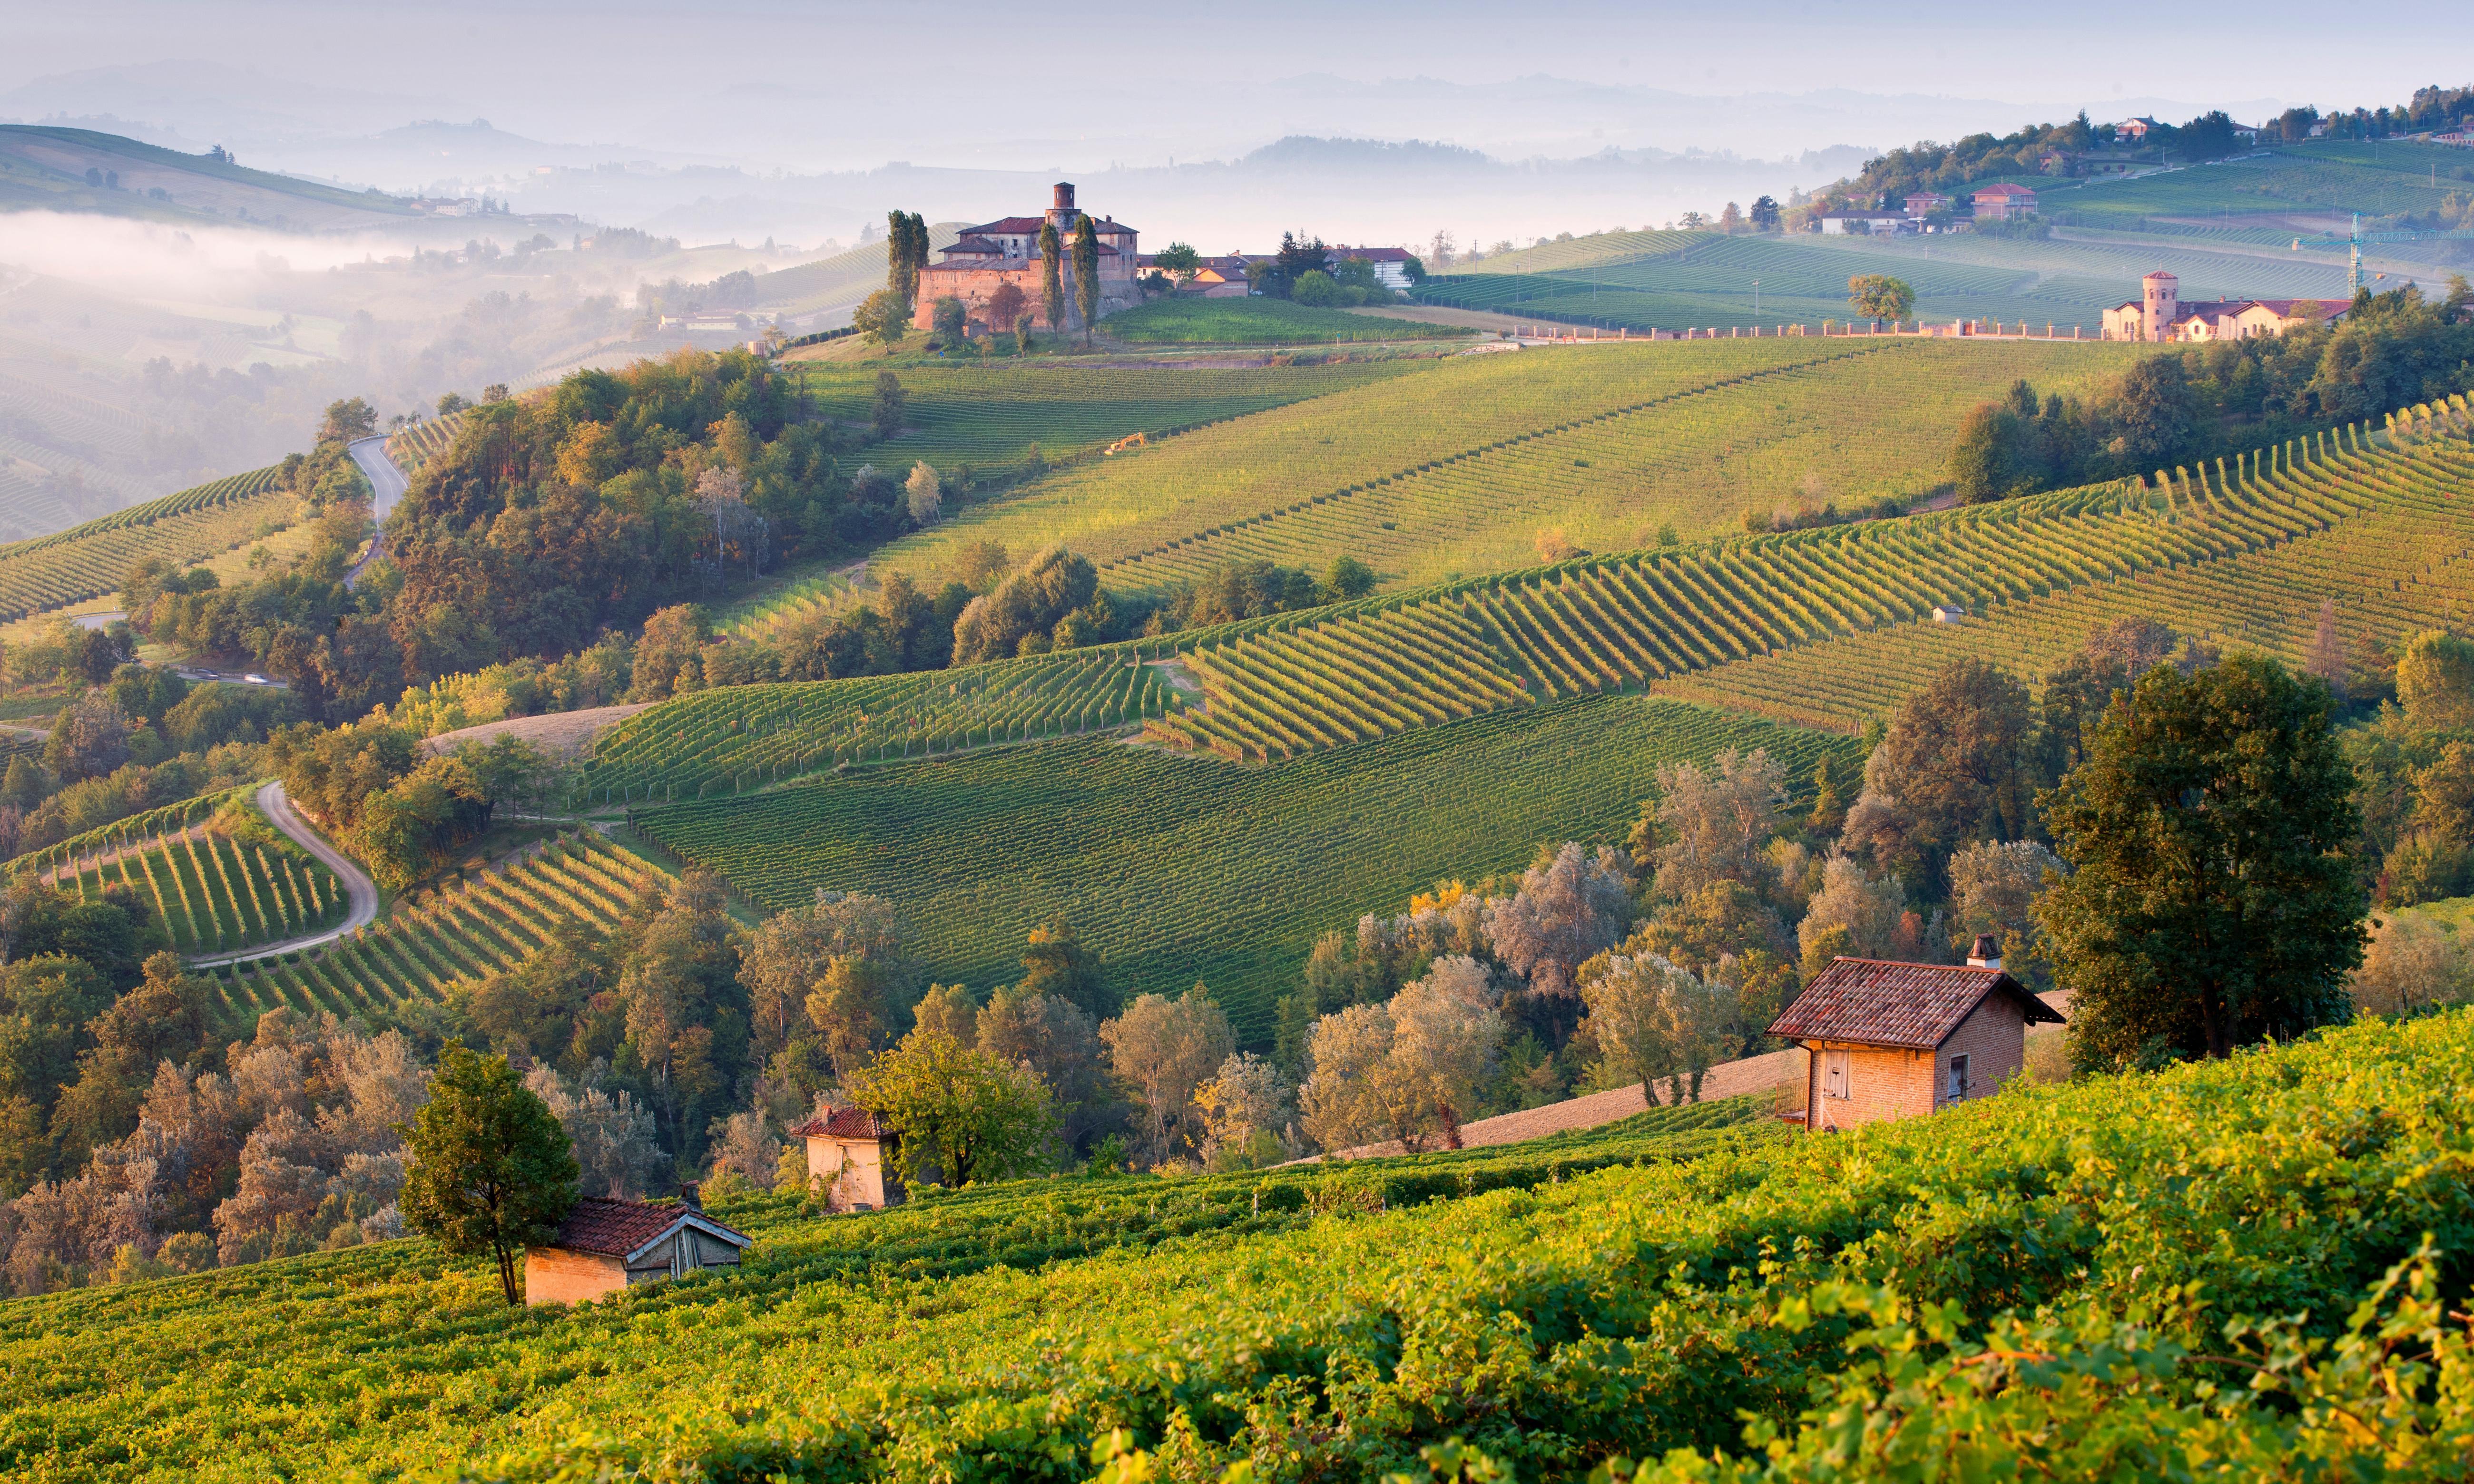 Land of plenty: harvest time in Piedmont, Italy